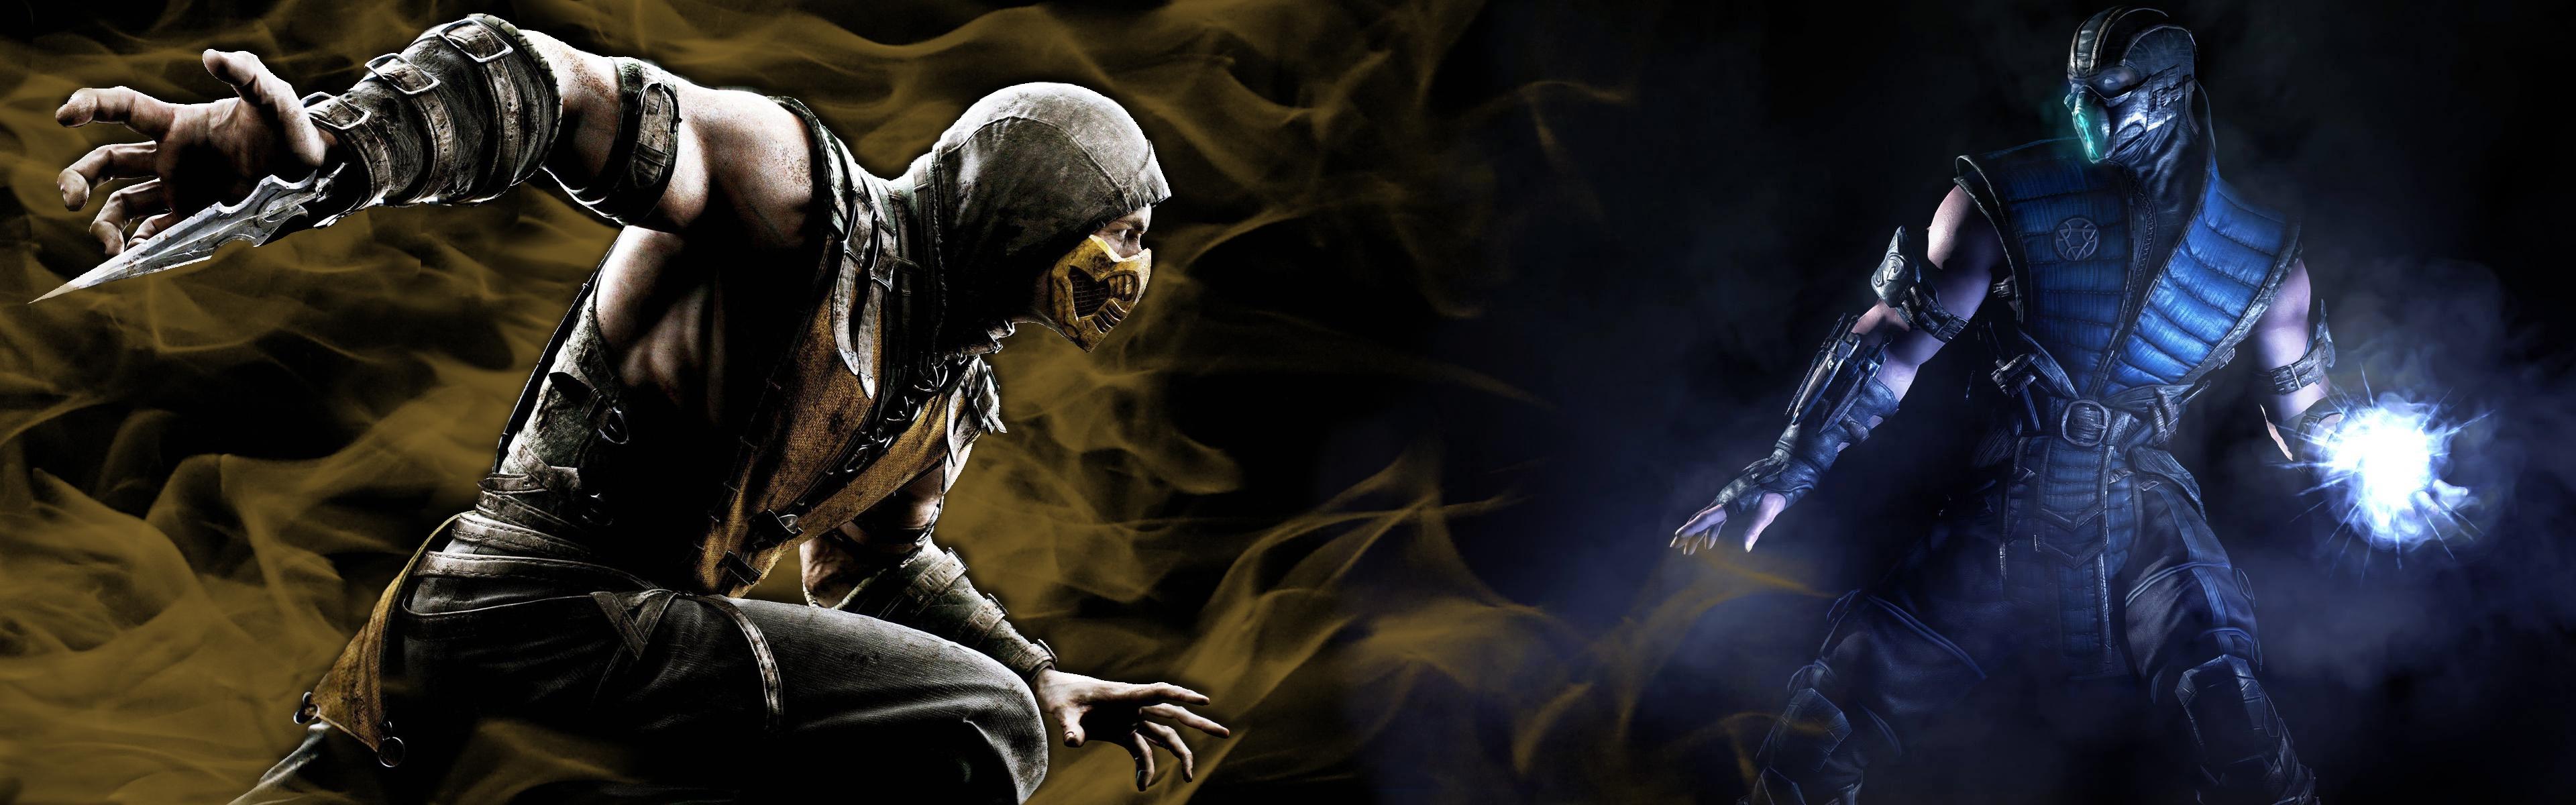 Mortal Kombat X Background Scorpion vs Sub Zero by Hentiger5544 on 3840x1200